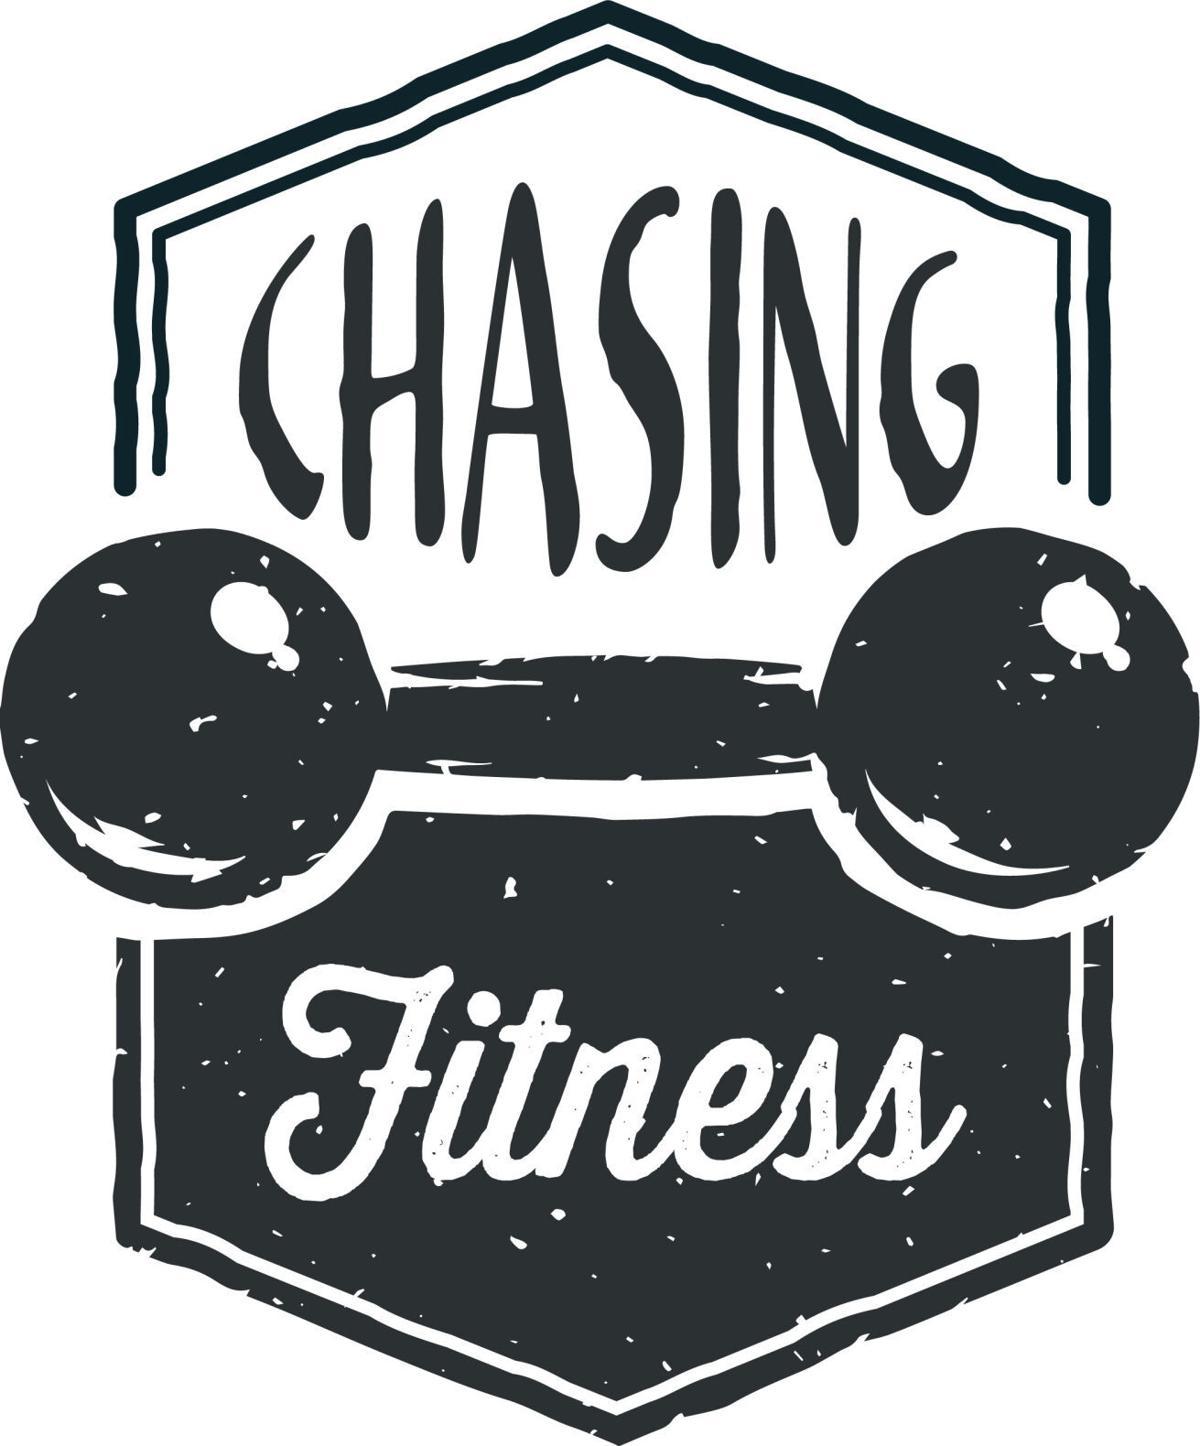 Chasing Fitness logo